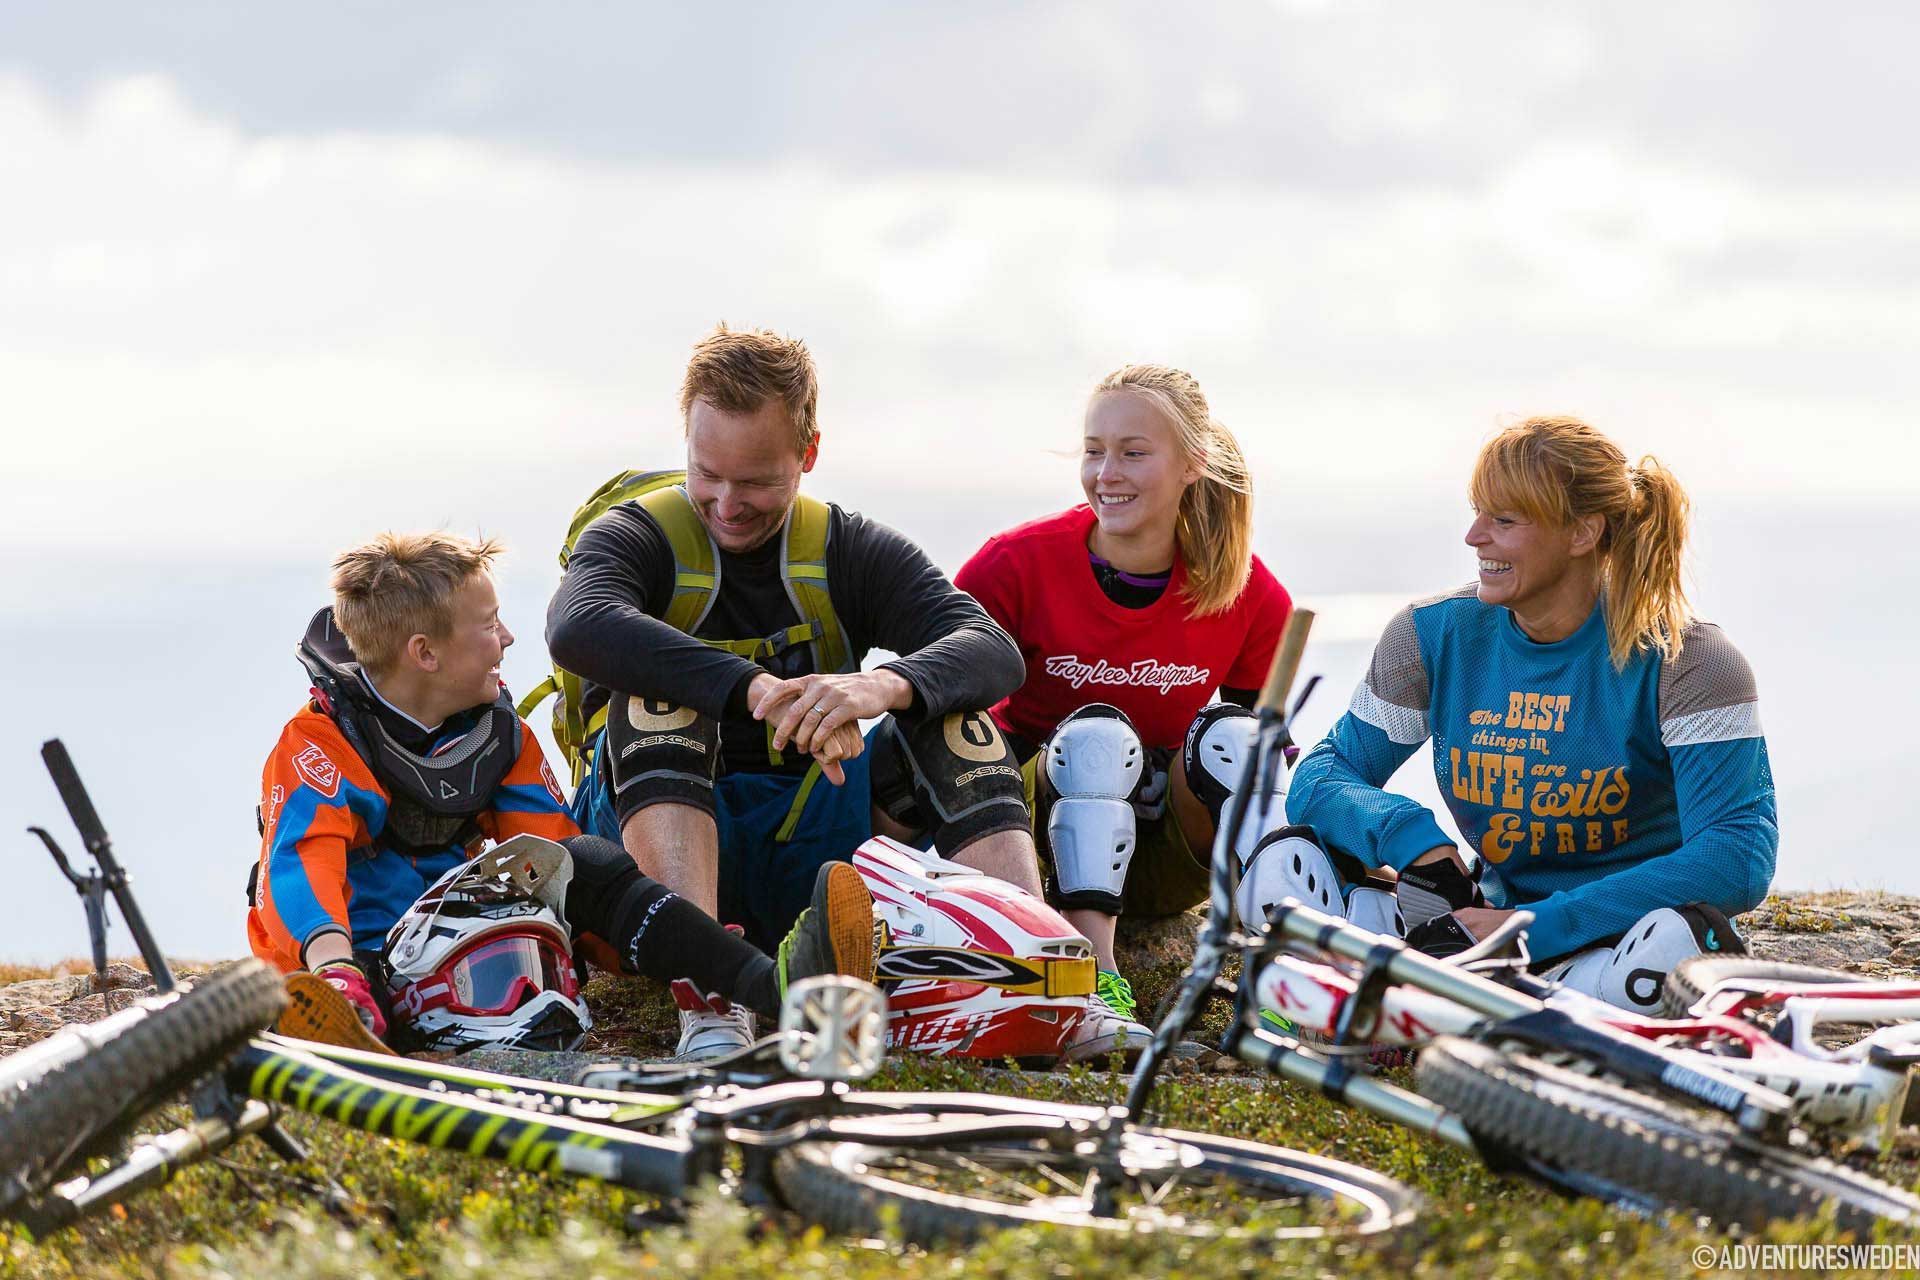 Downhill, cykling i Åre | Foto: Niclas Vestefjell